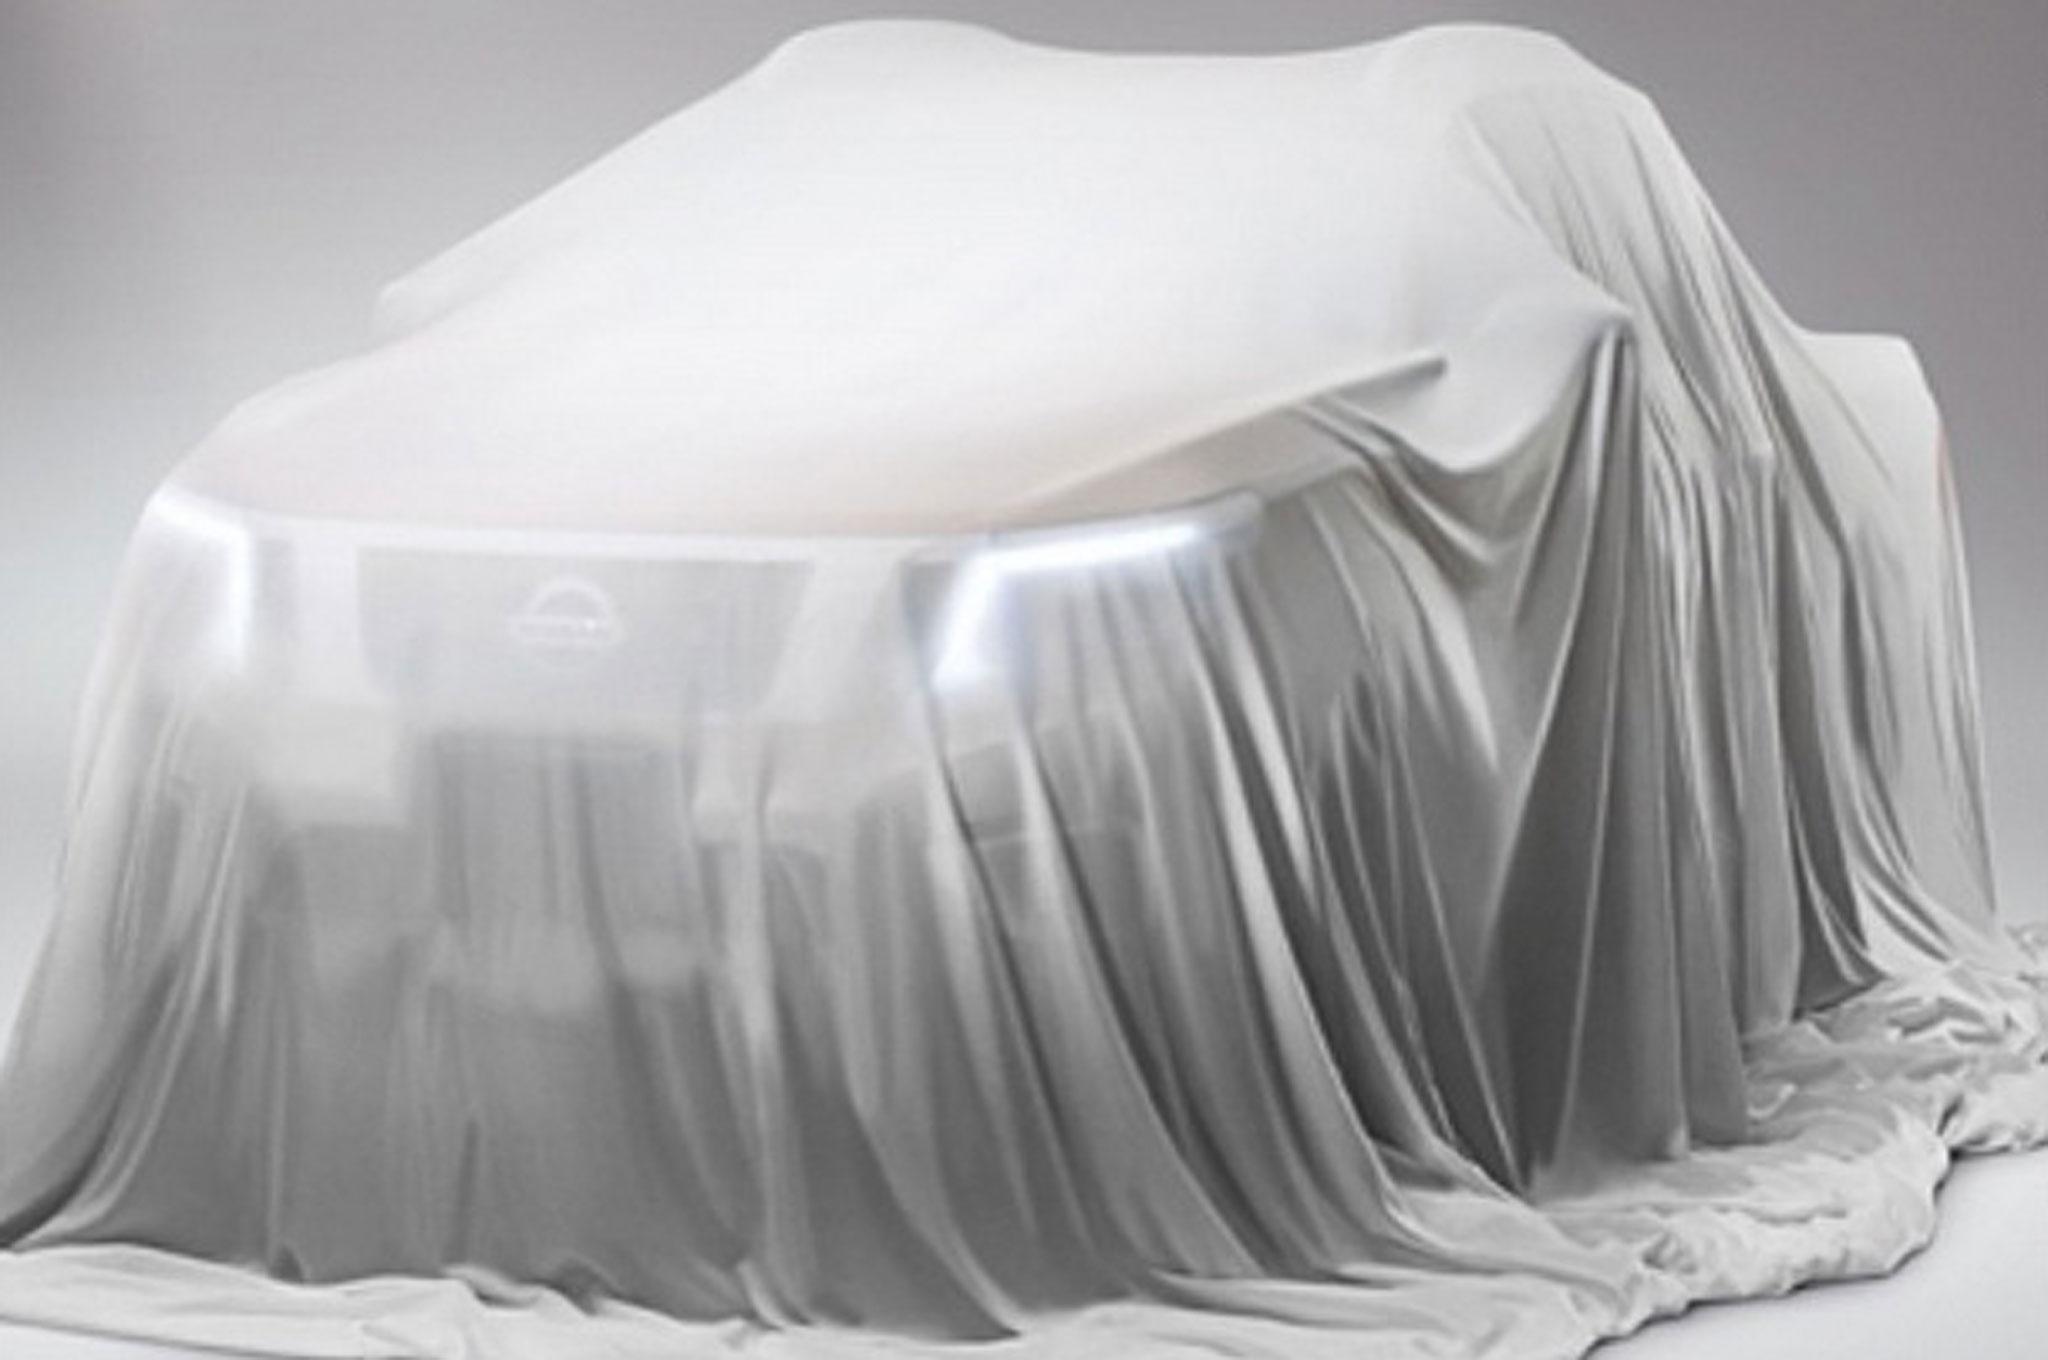 Nissan Truck Teaser Photo 1